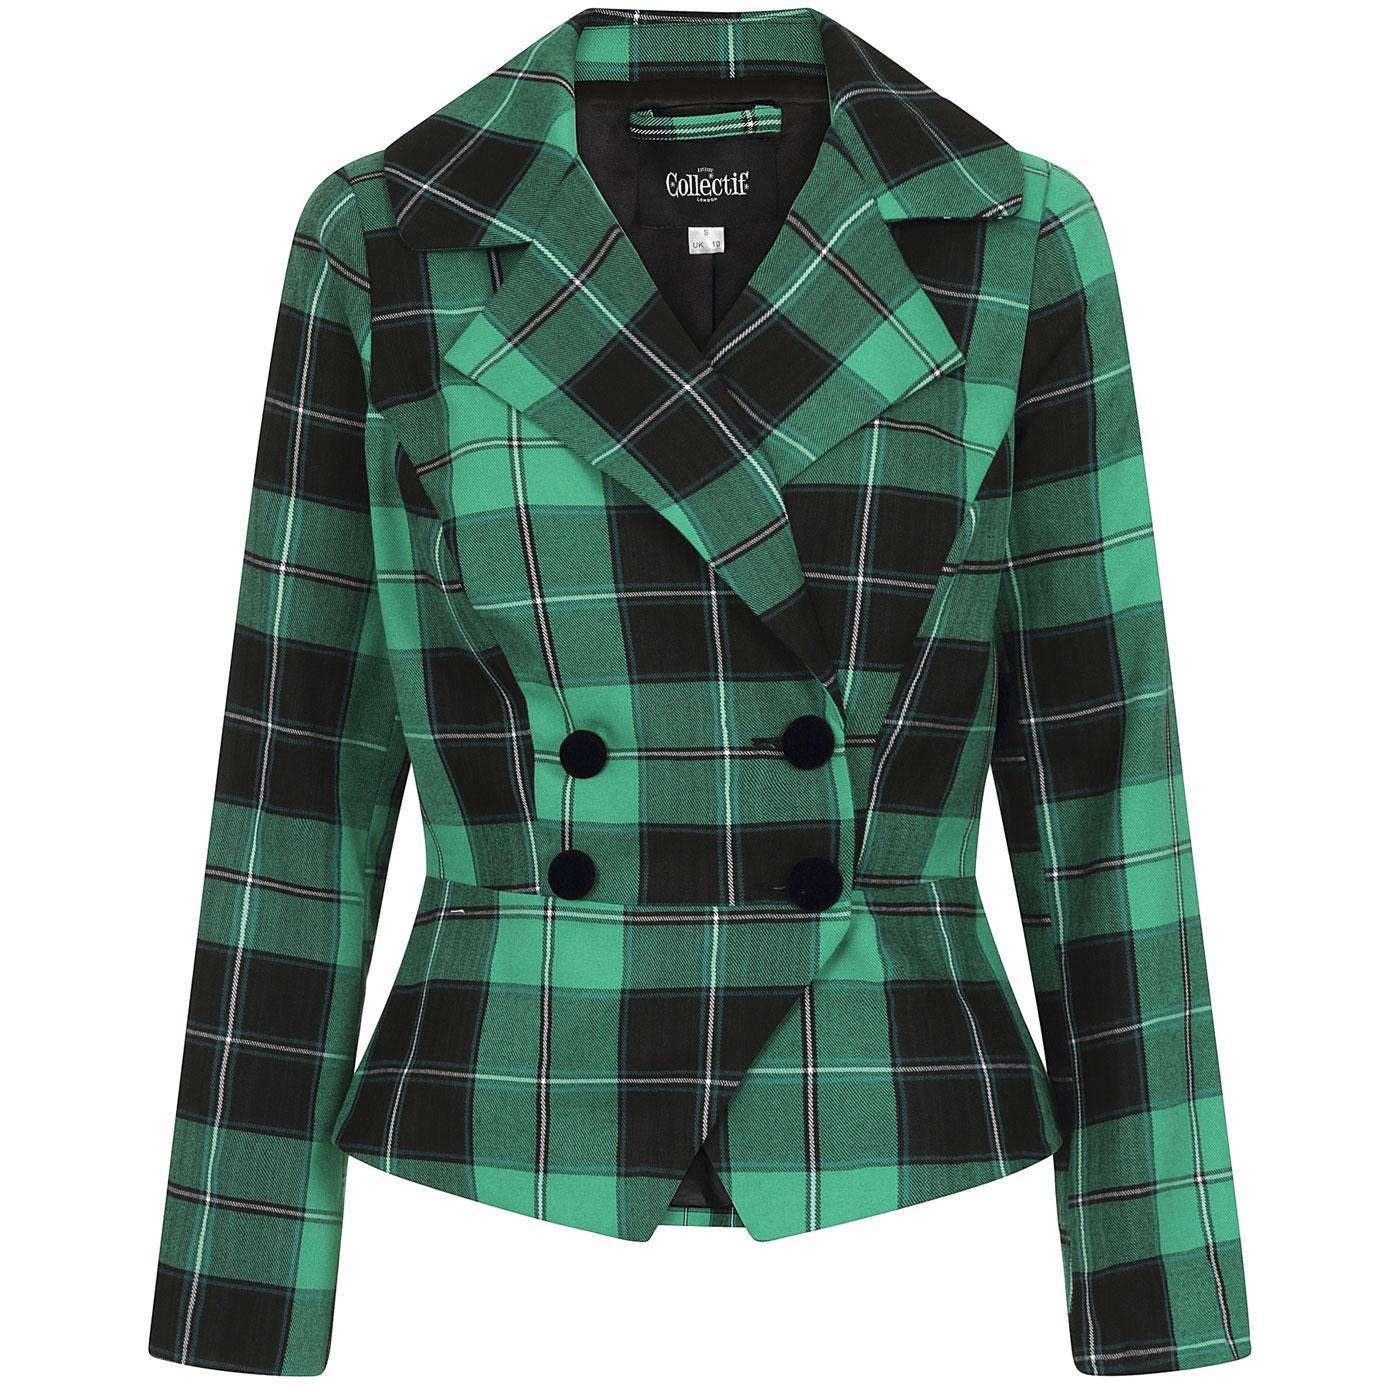 Halle COLLECTIF Retro Foliage Check Suit Jacket